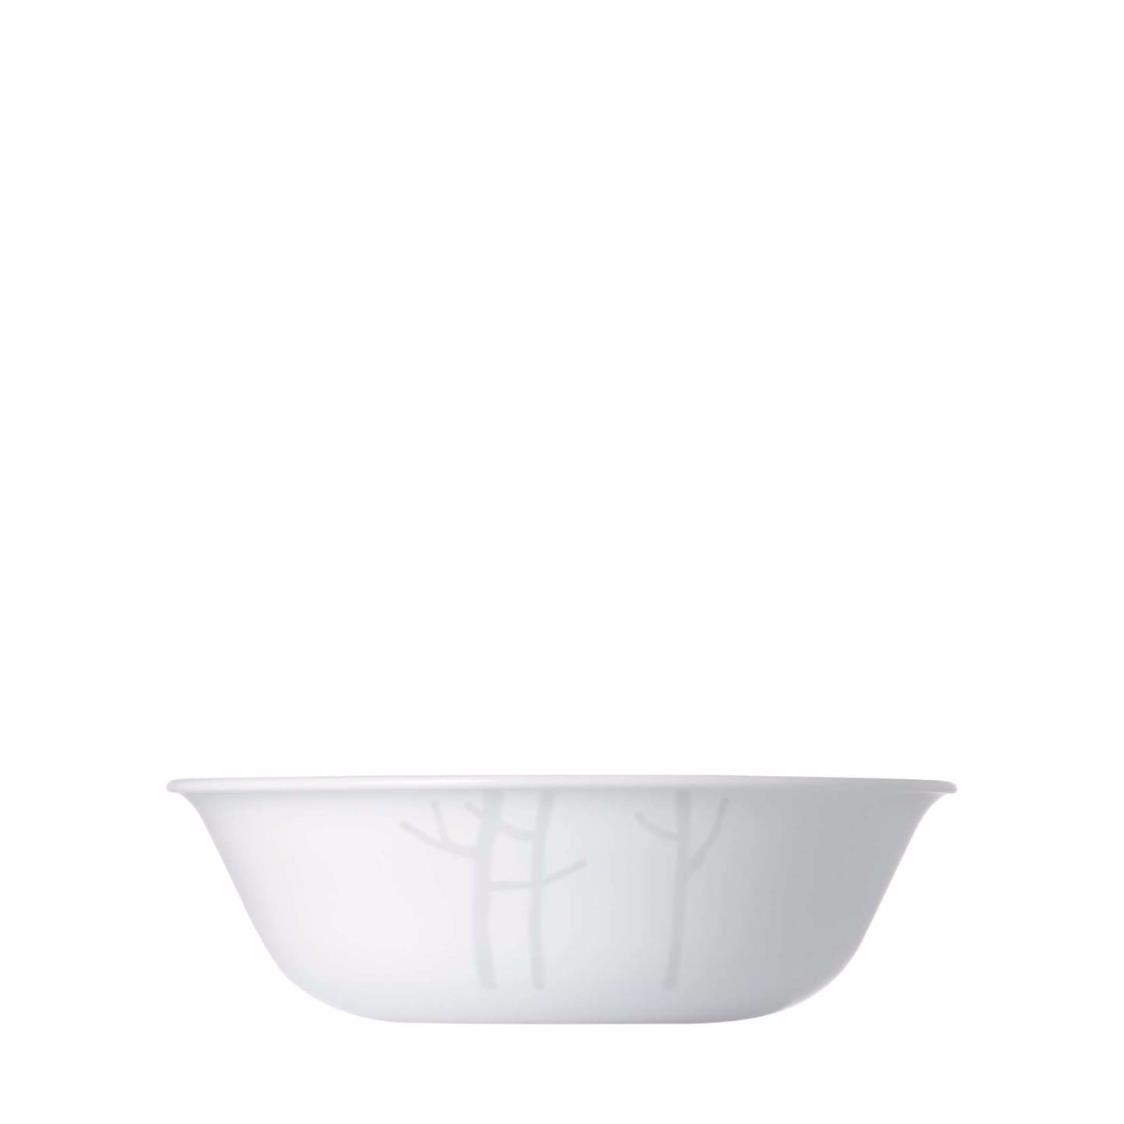 Corelle Soup Cereal Bowl Frost